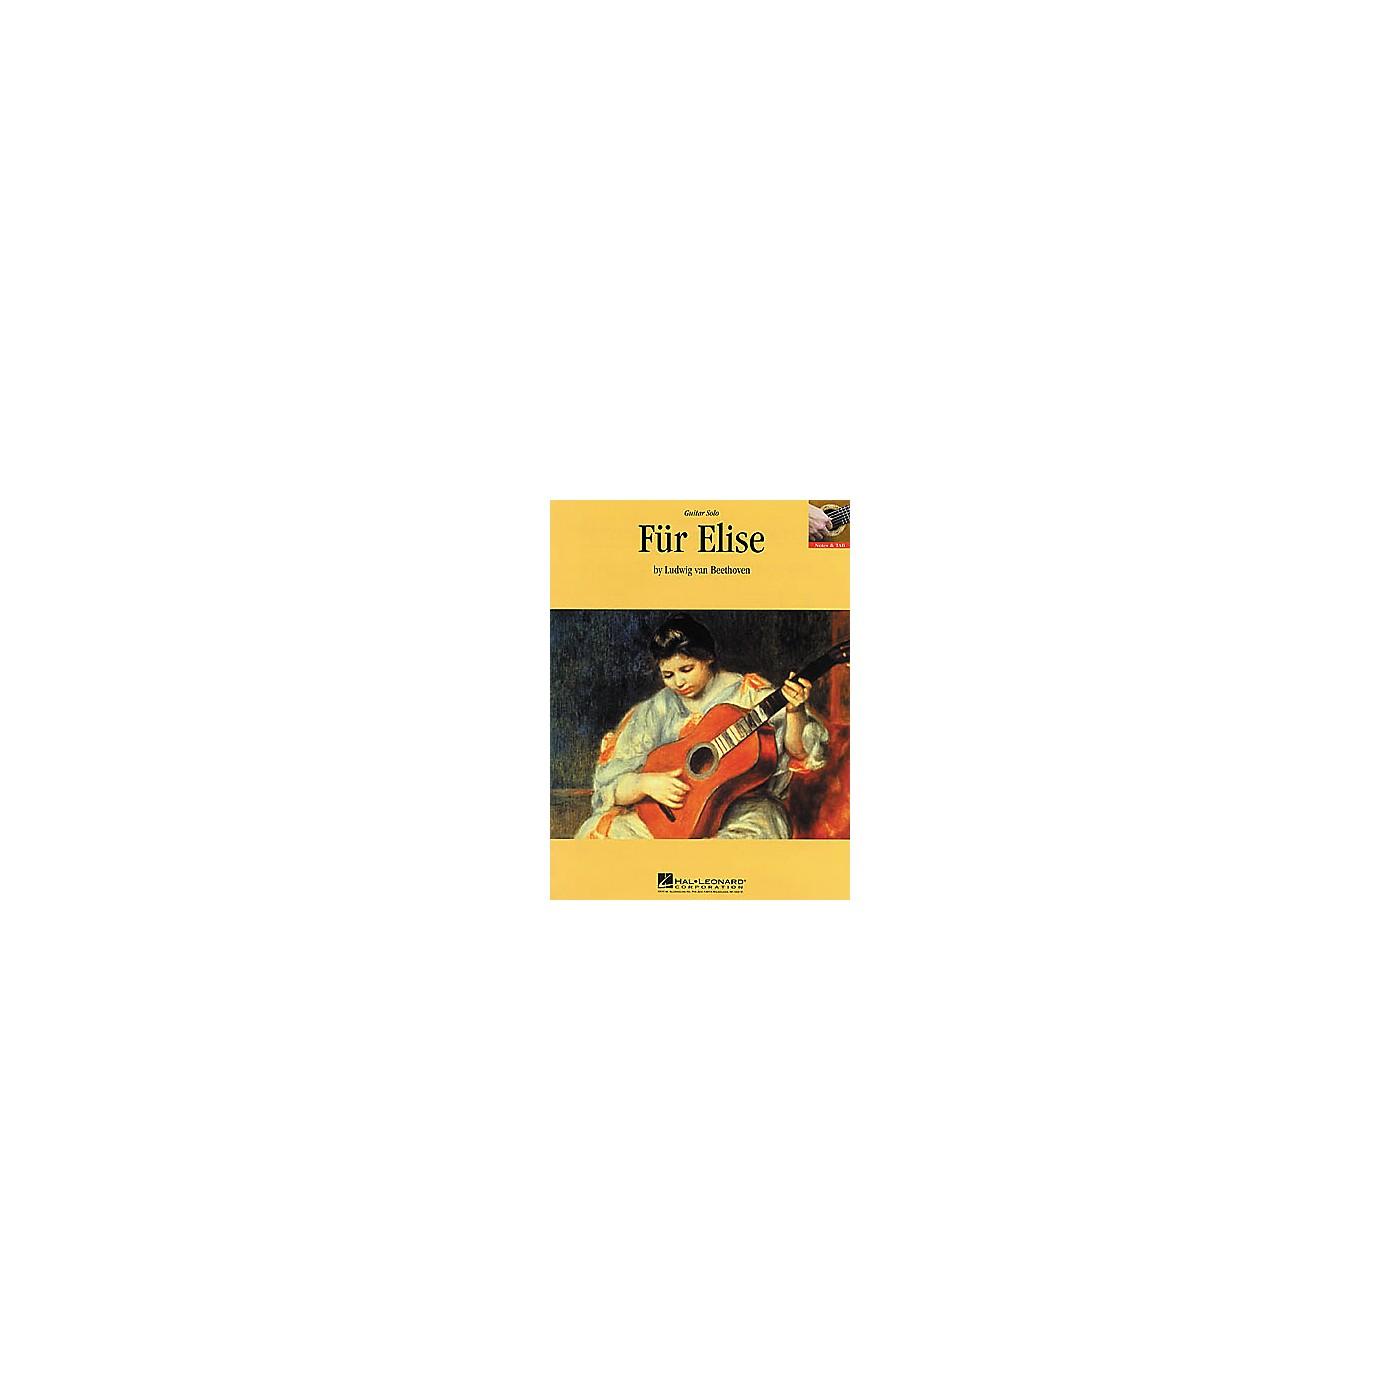 Hal Leonard Beethoven: Fur Elise Guitar Sheet Music Book thumbnail